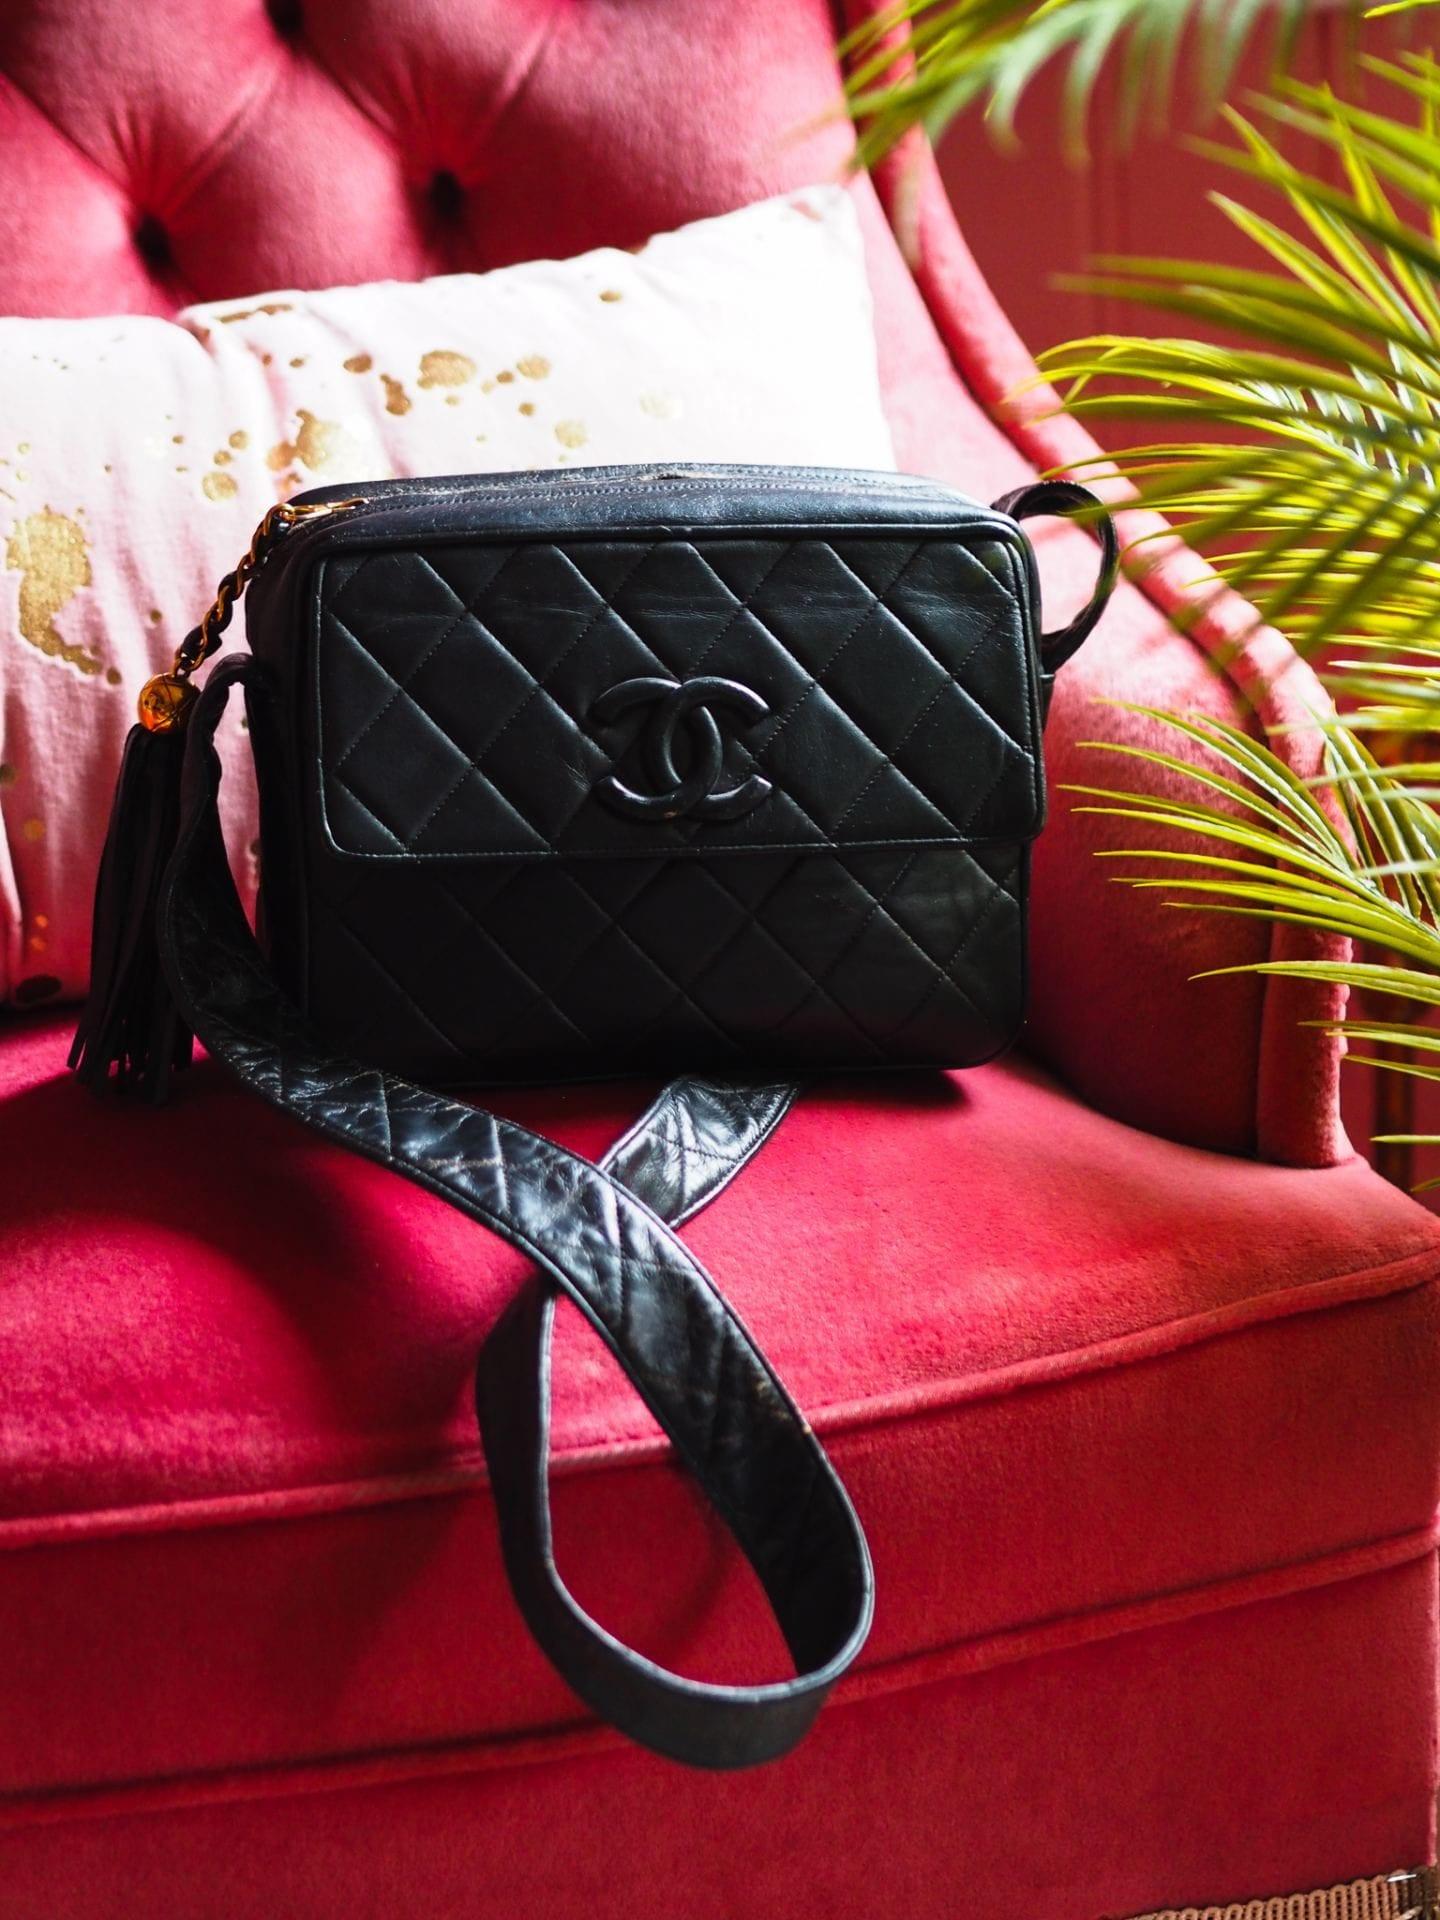 vintage chanel camera bag black lambskin leather review 80's preloved